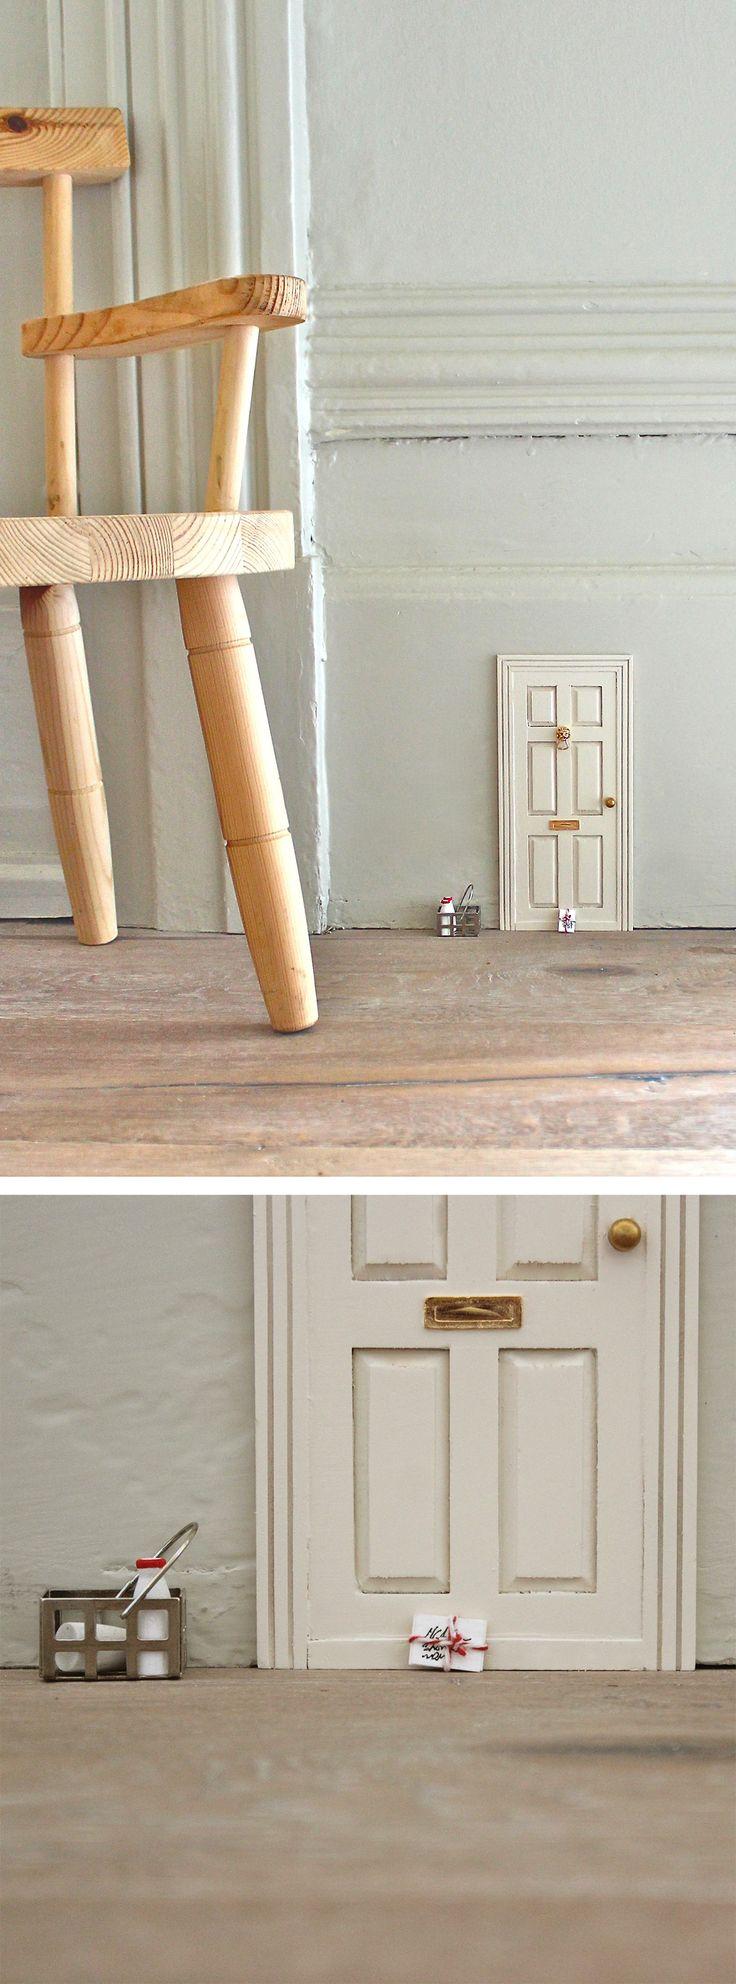 Install a little fairy tale door - such a cute idea!